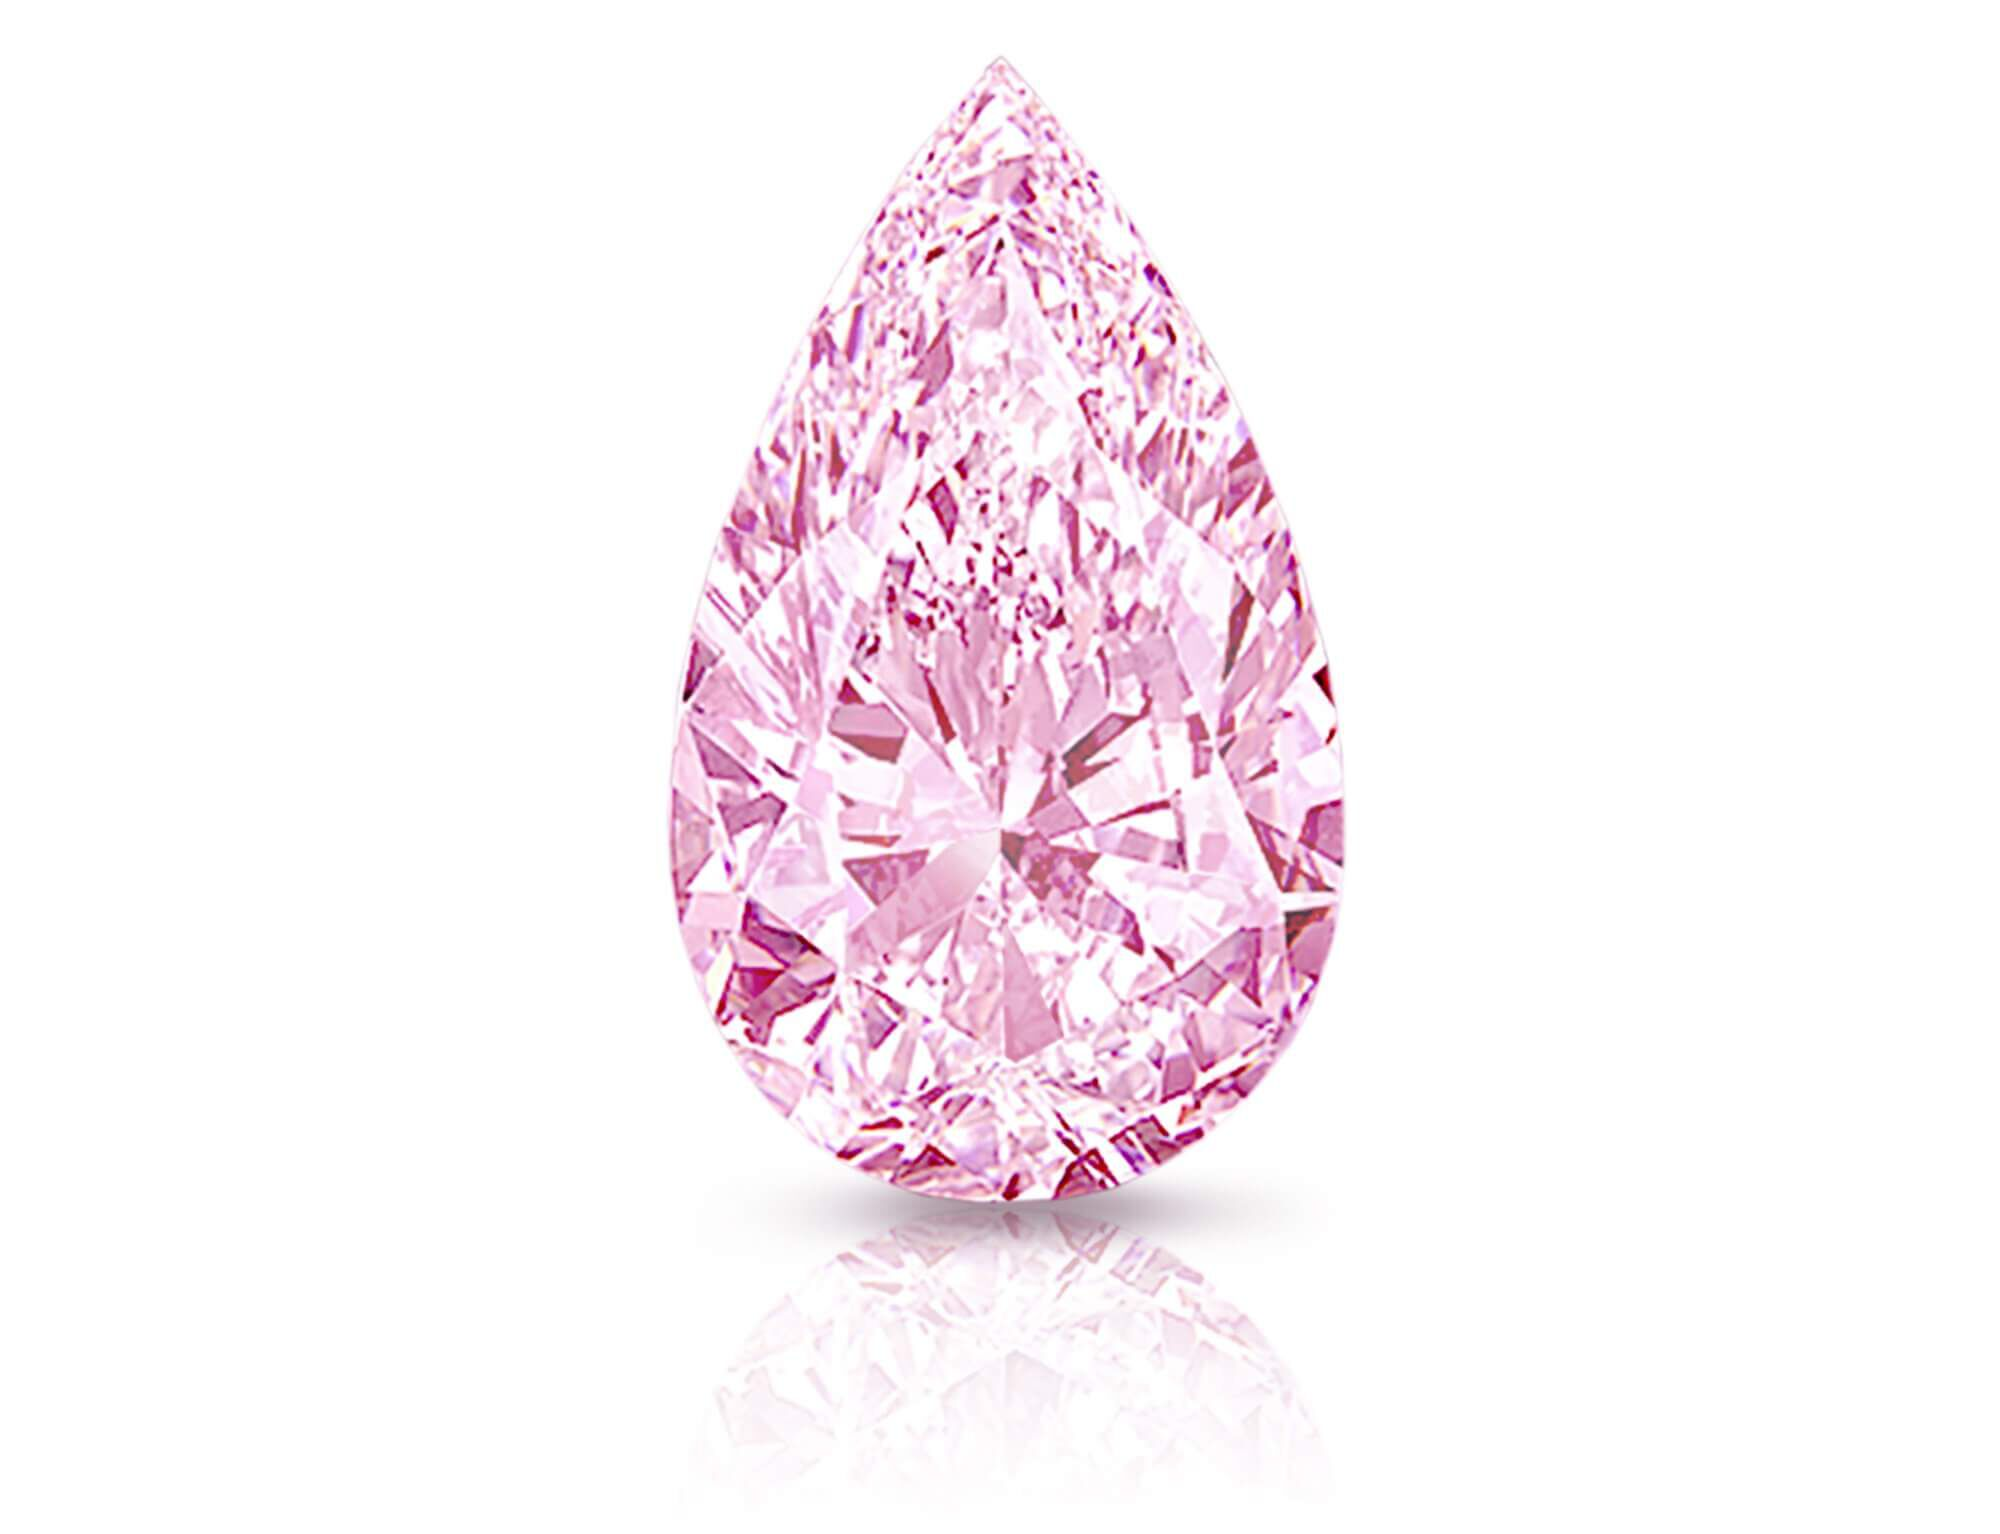 The pear shape pink diamond 'Empress Rose' by Graff